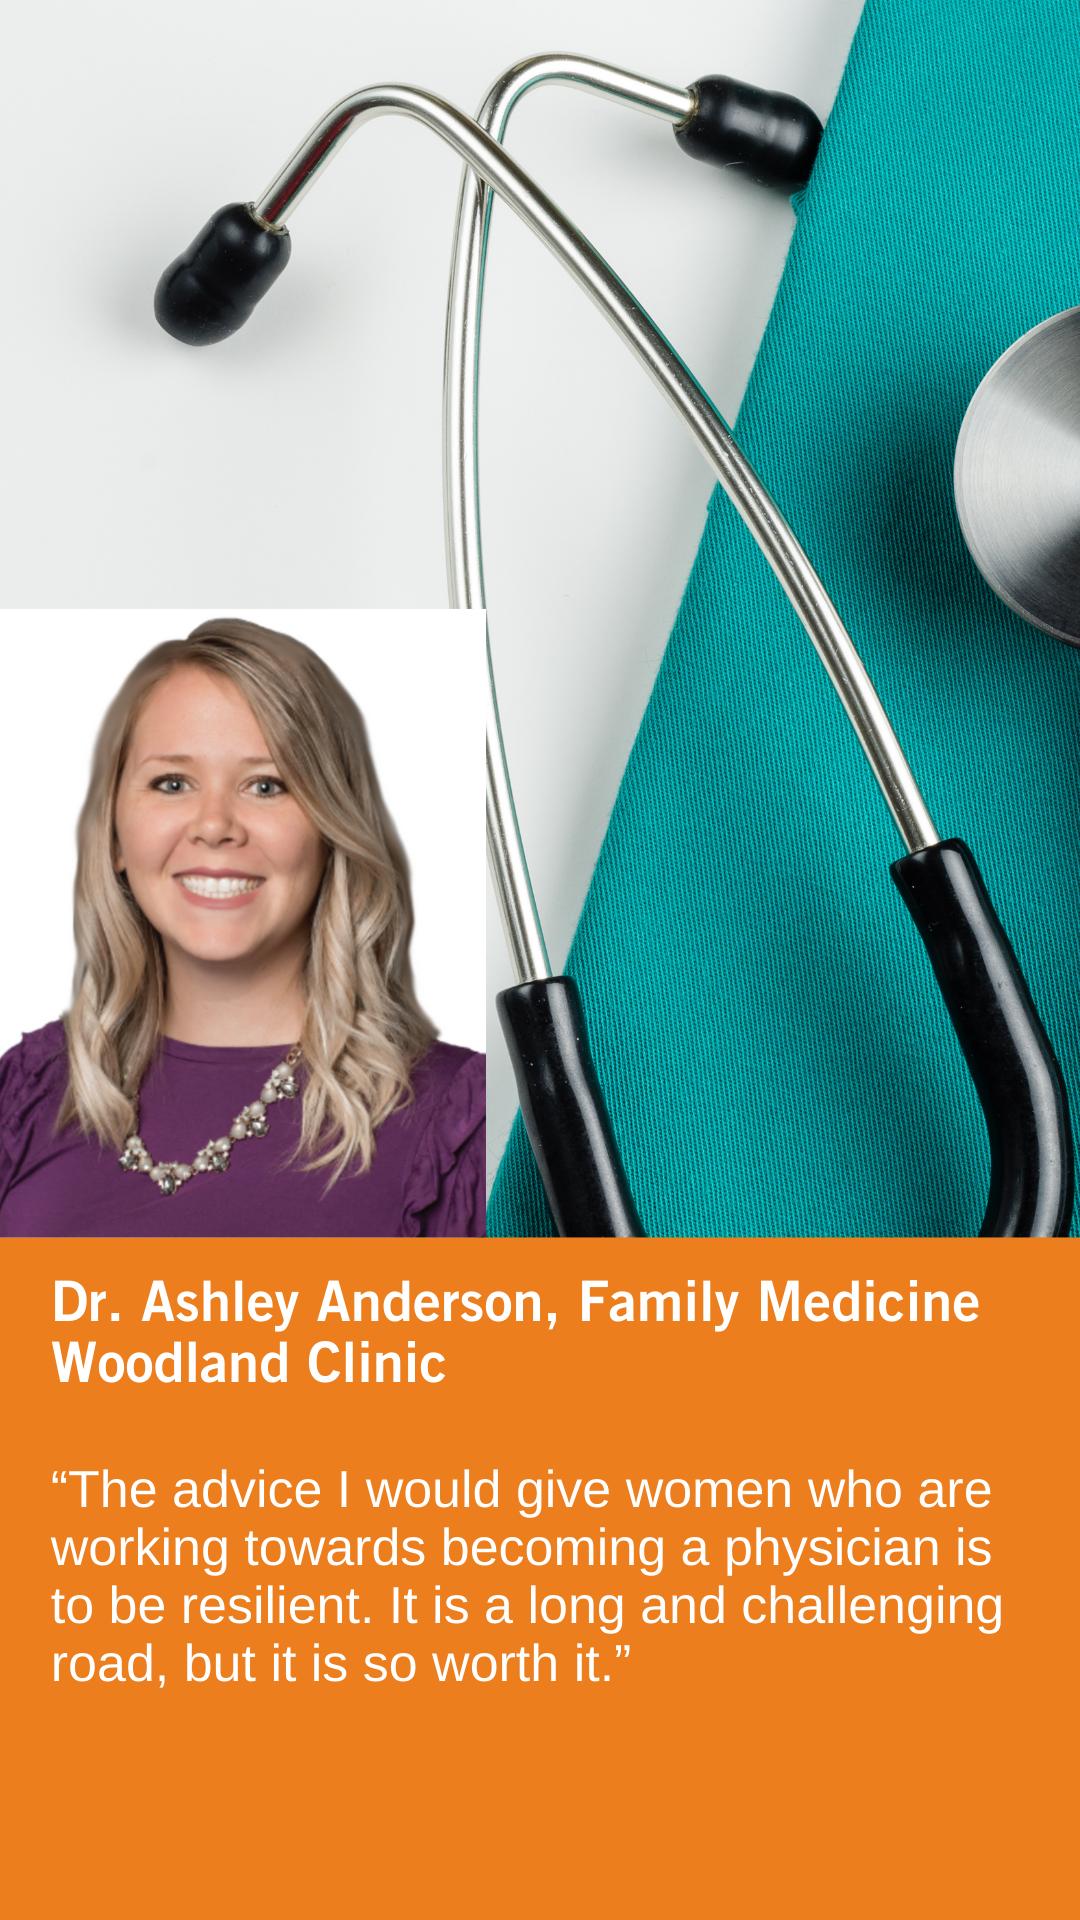 Ashley Anderson, DO, Family Medicine, Woodland Clinic